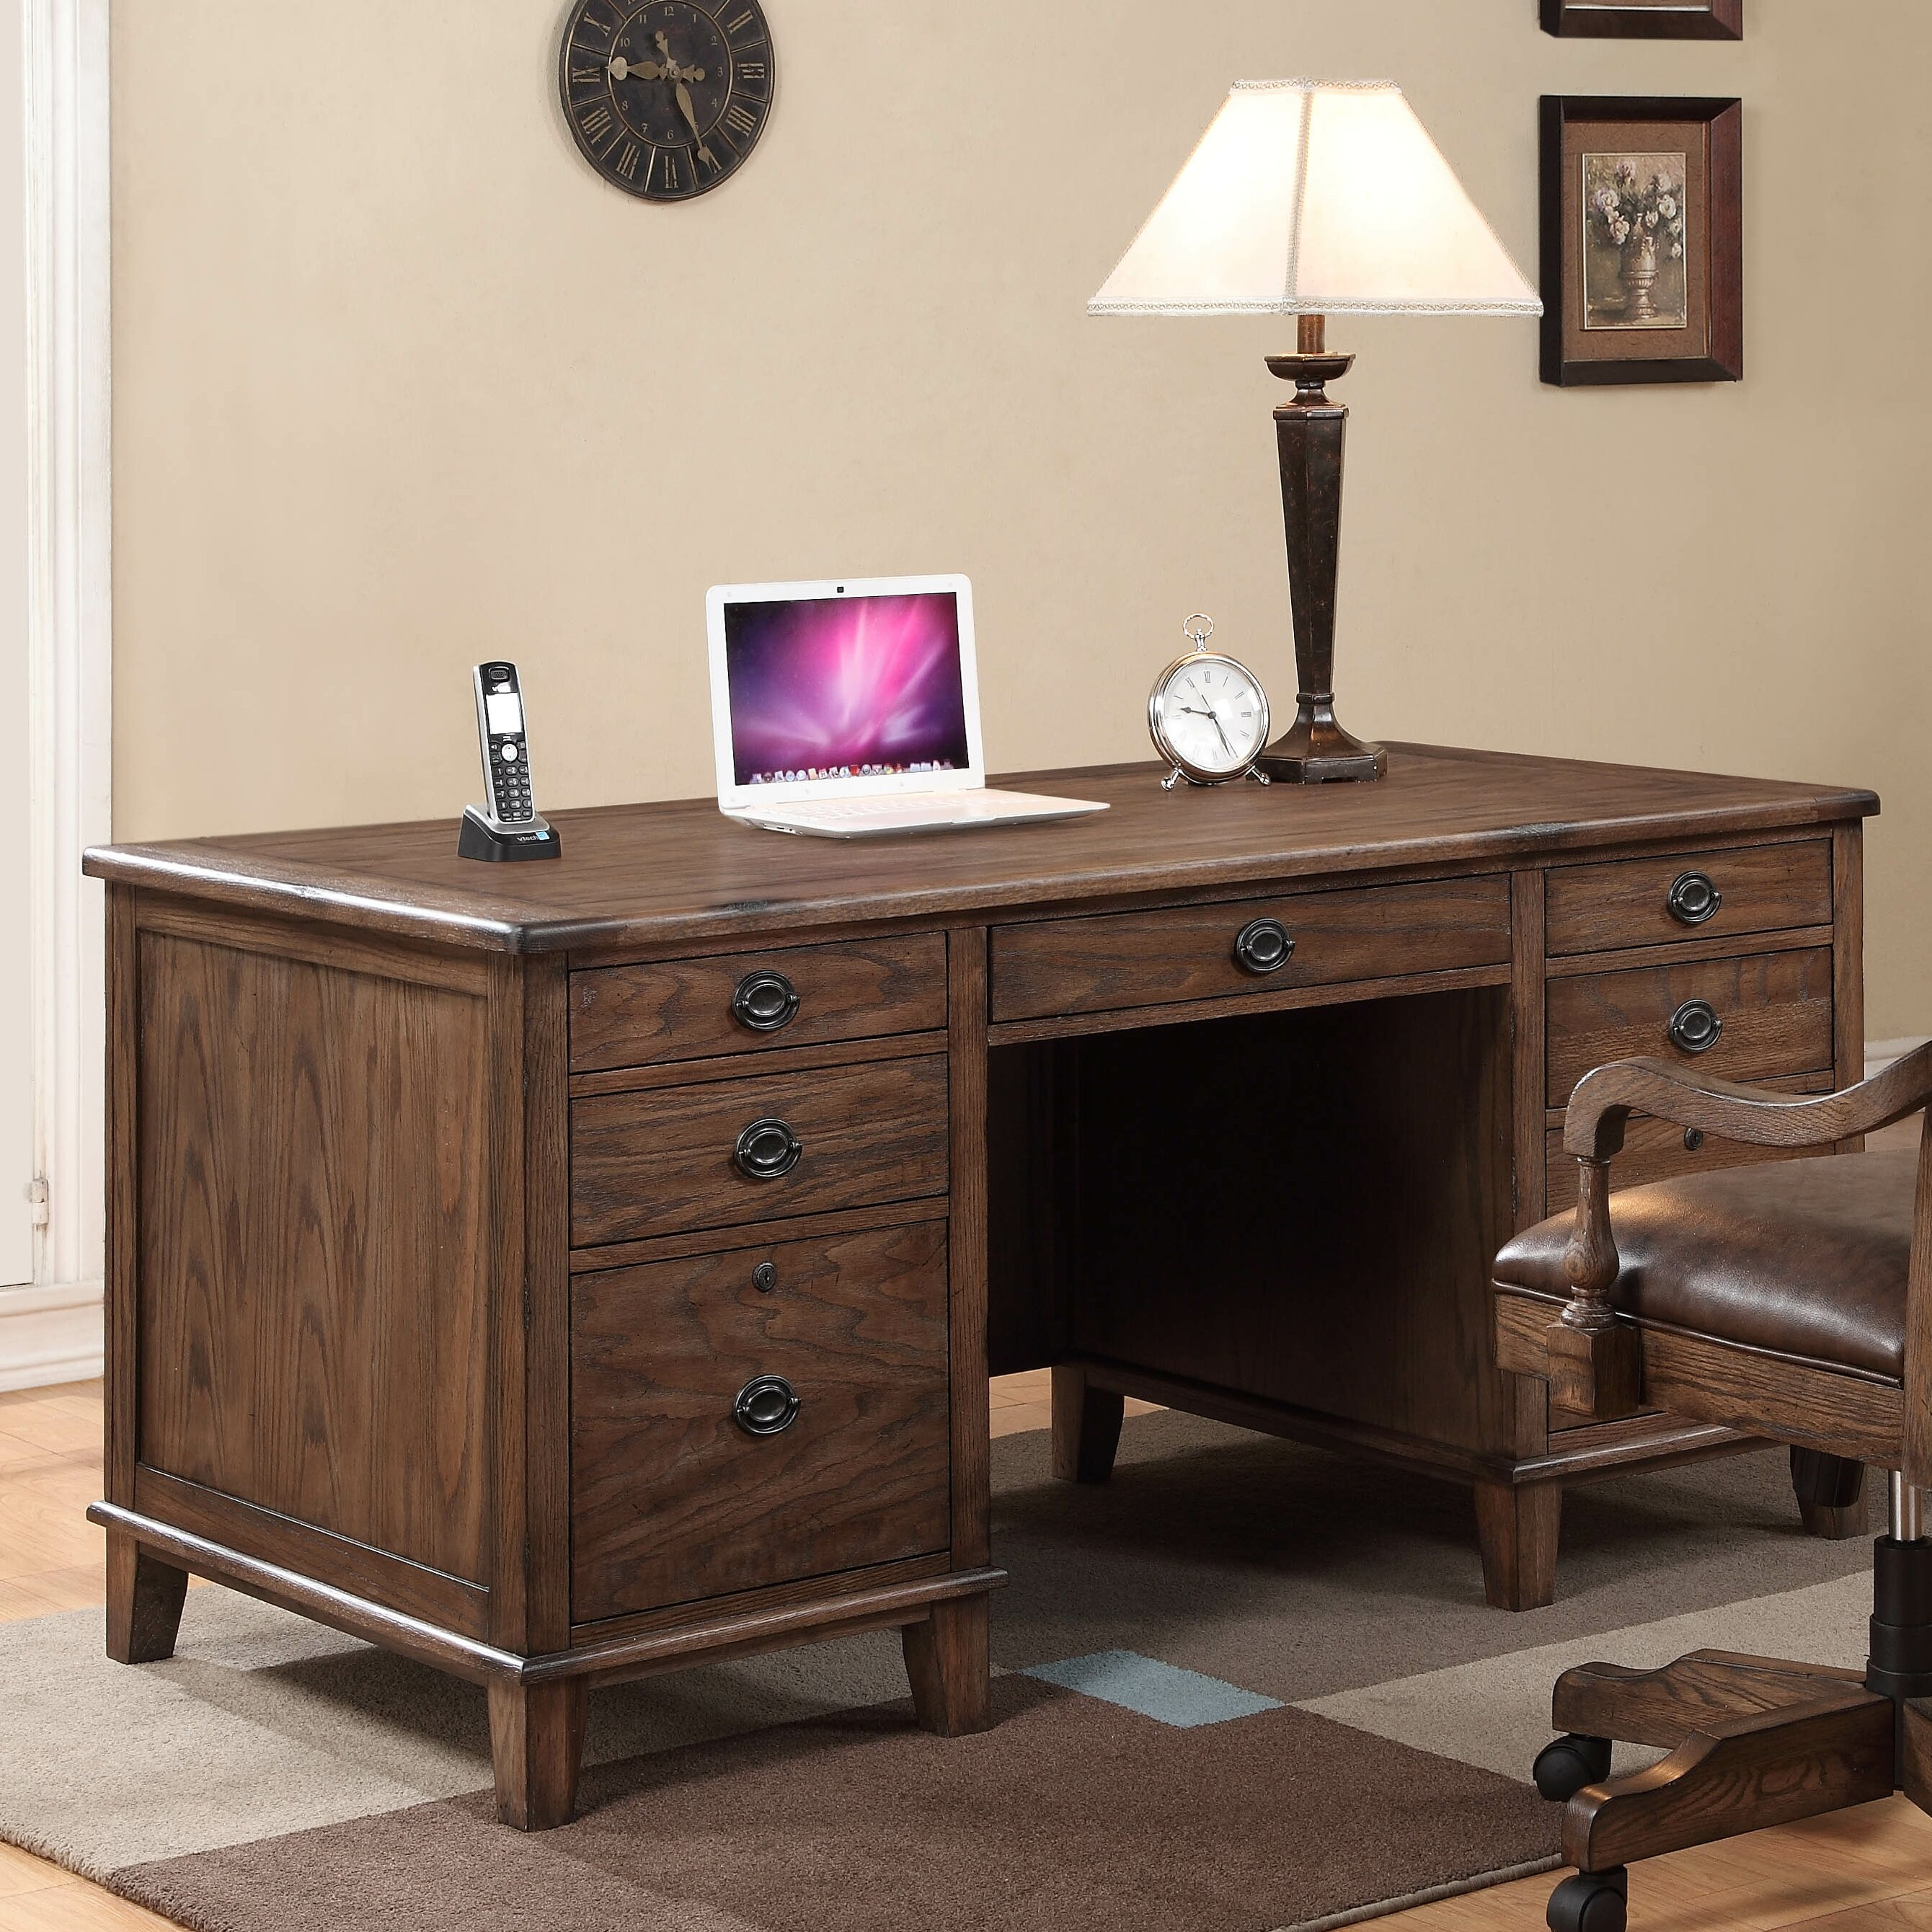 Fairfax Home Collections Harrison Flats Executive Desk